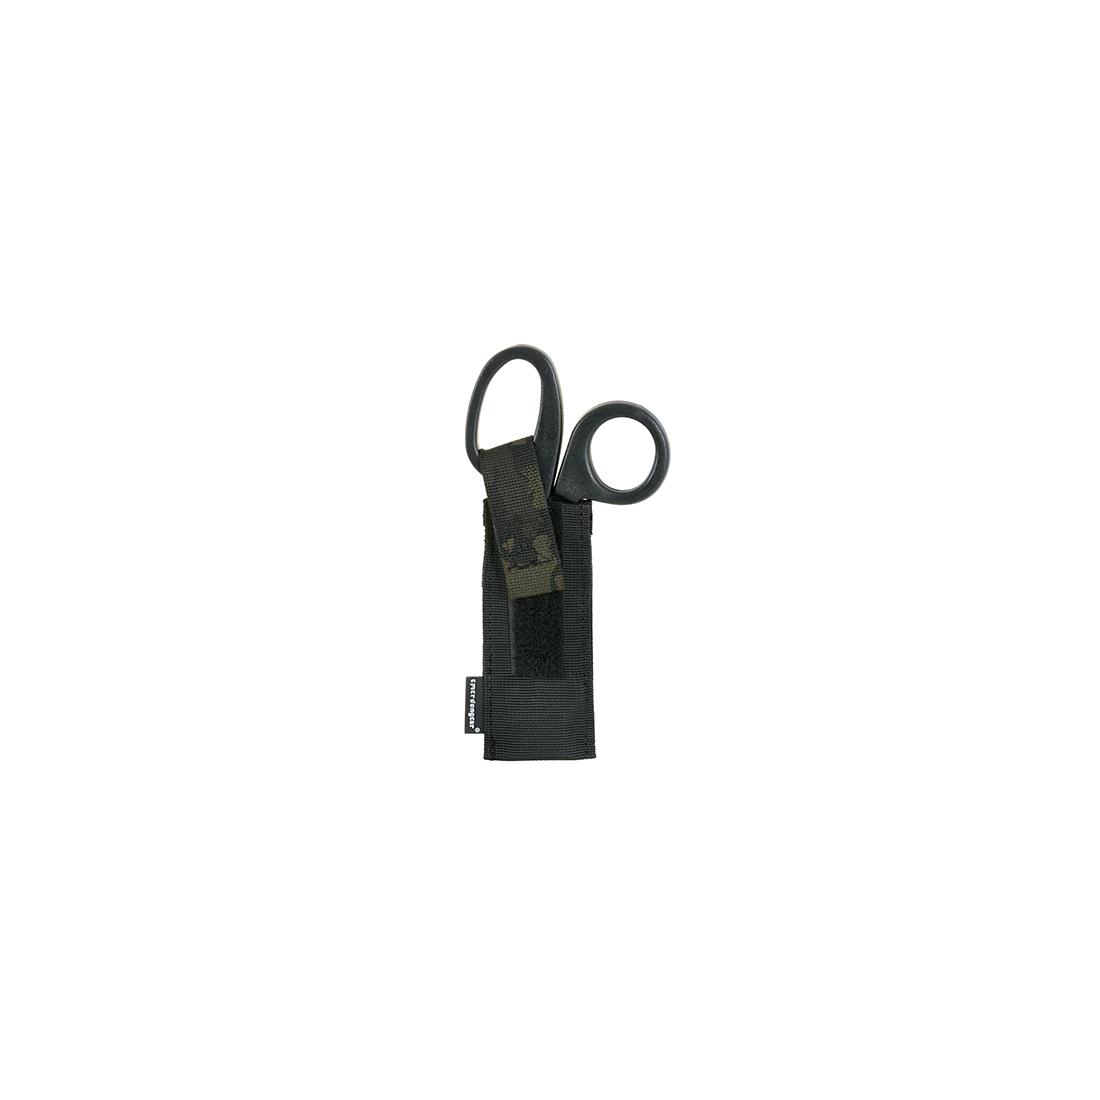 Pouch tactical seissors multicam black [EMERSON]